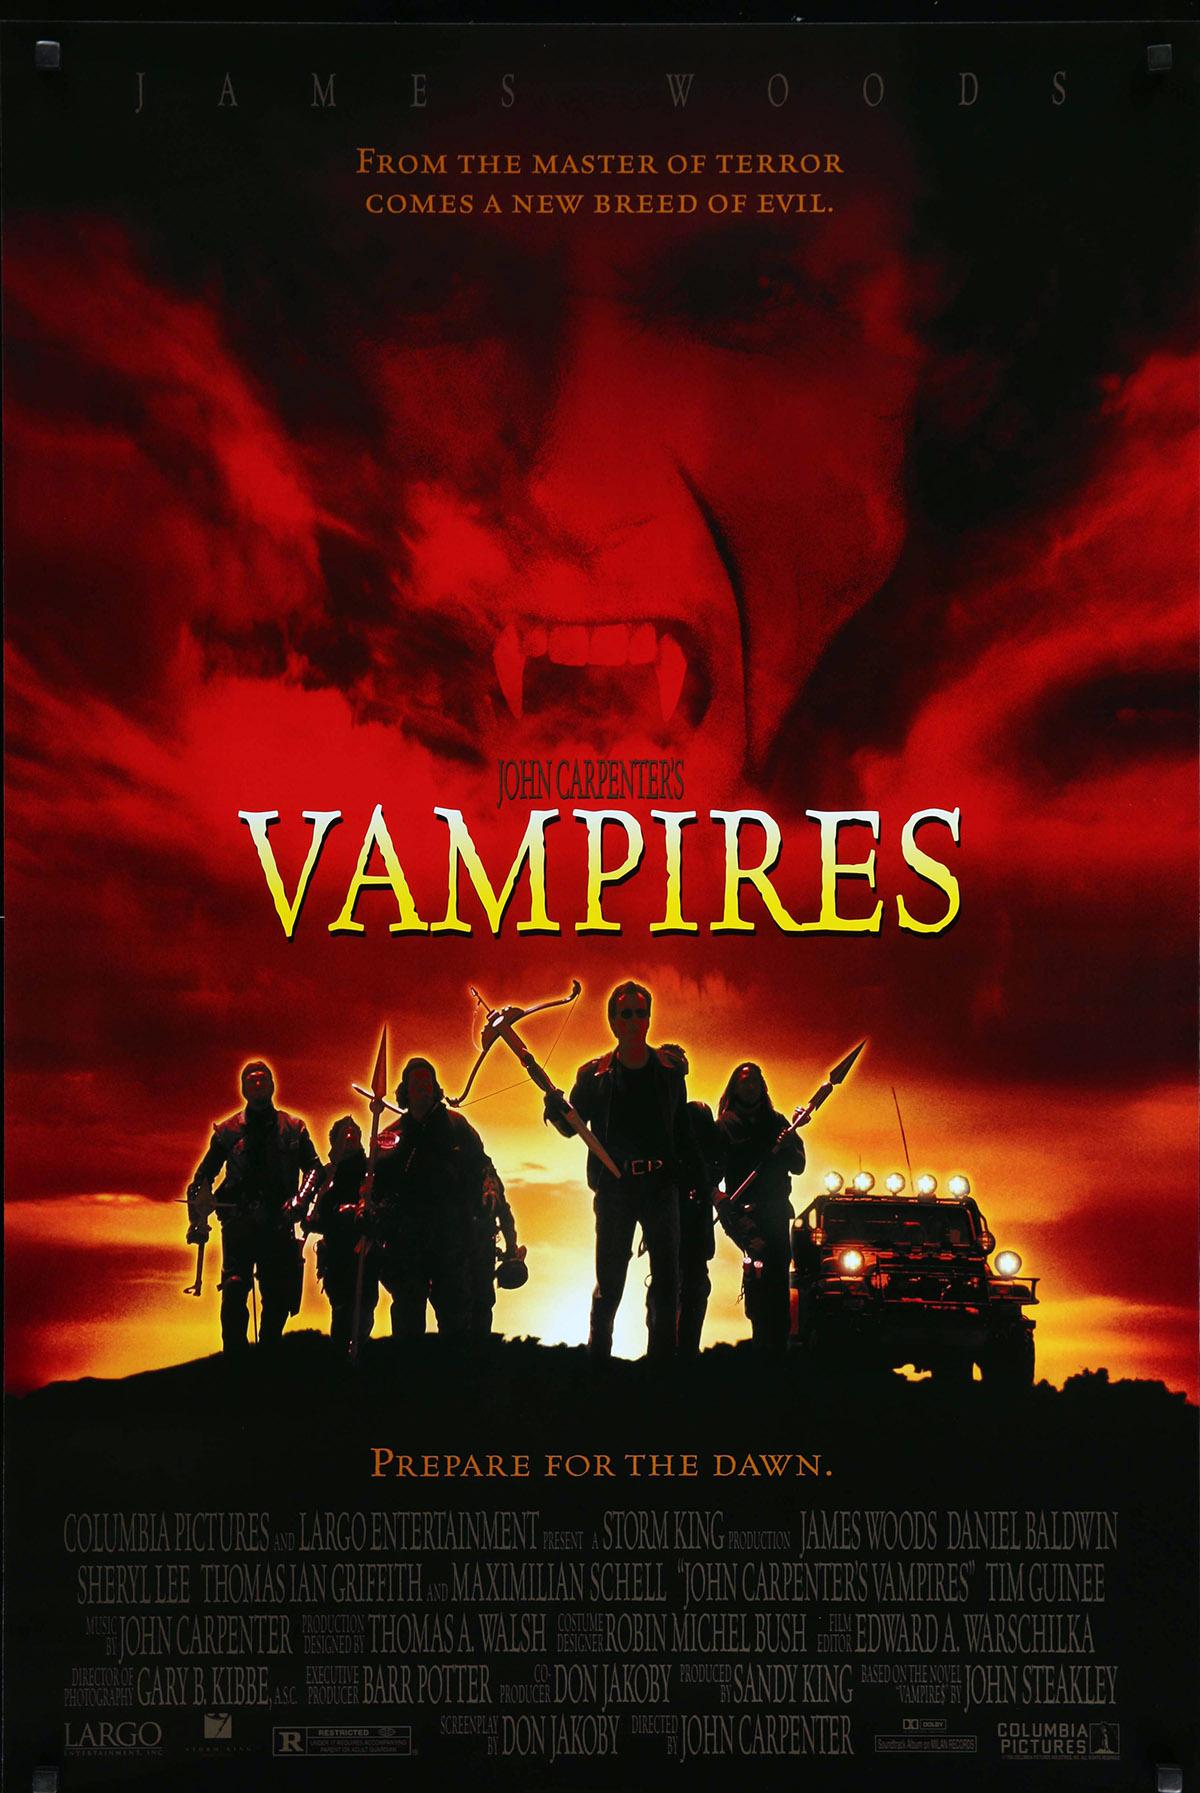 vampires-movie-poster-27x40-in-ds-1998-john-carpenter-james-woods